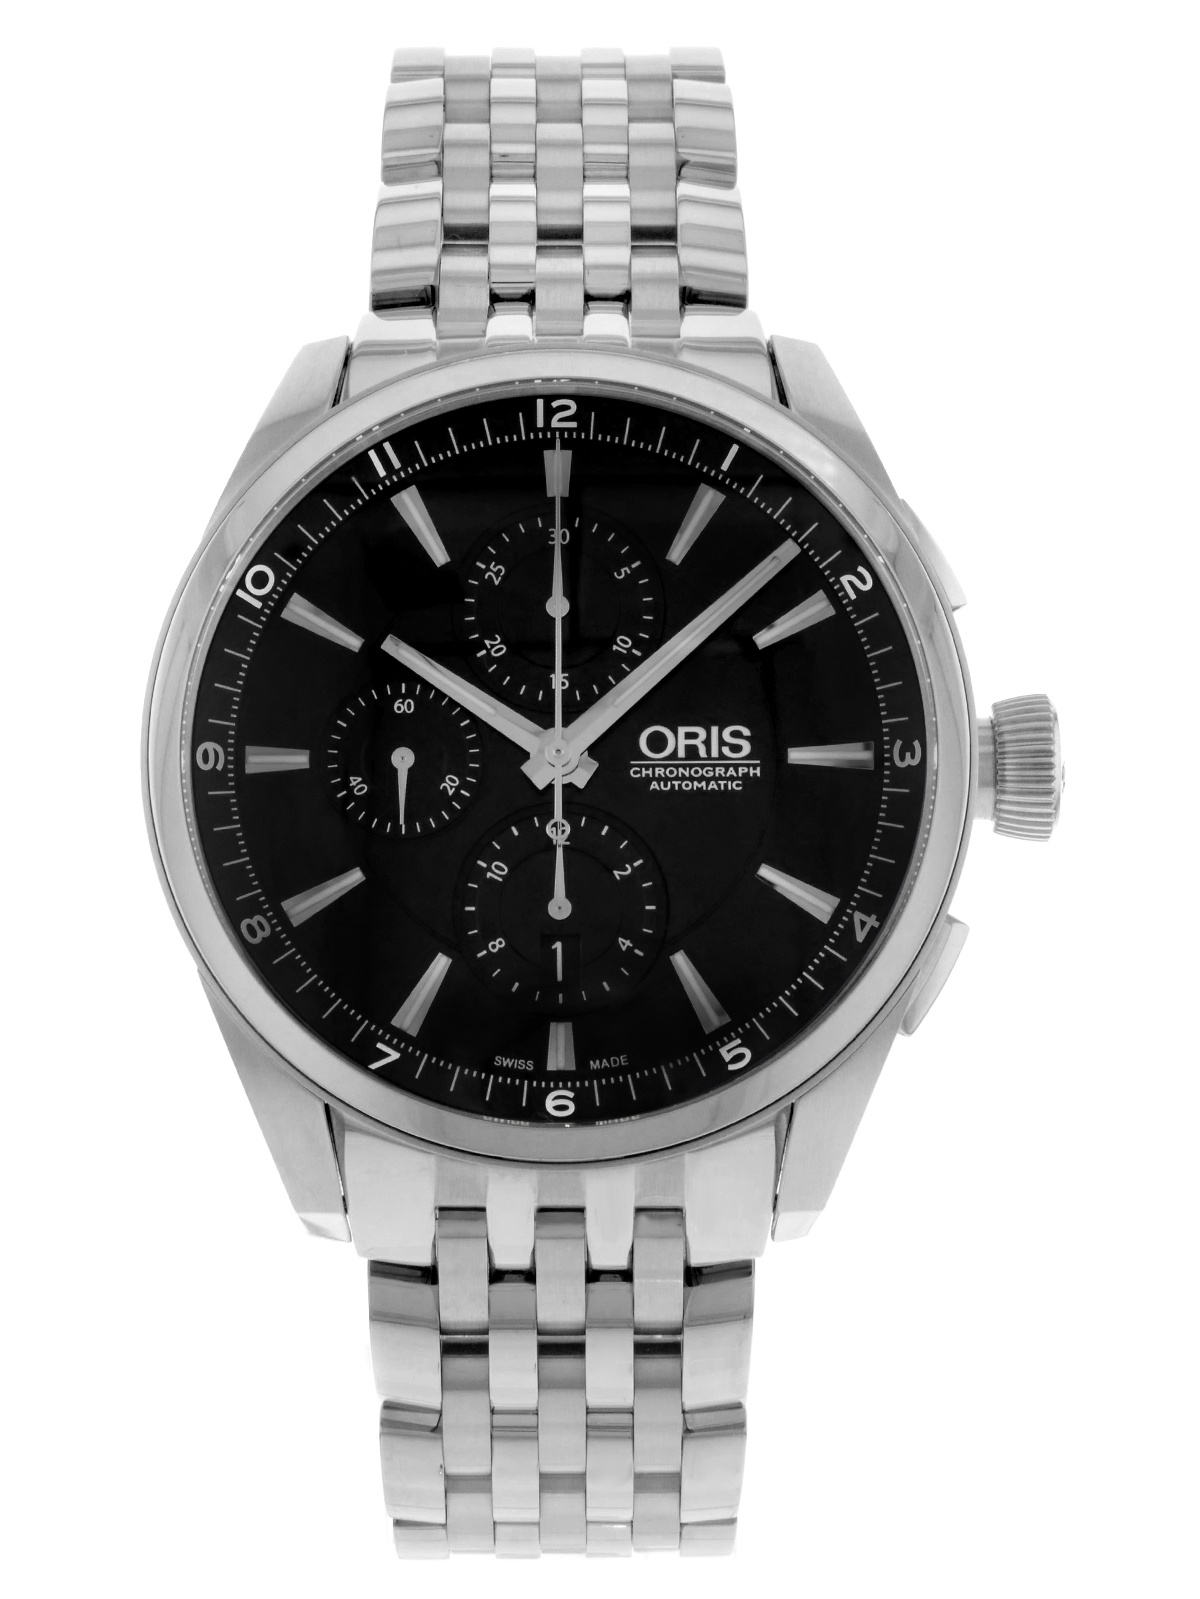 Artix 674-7644-4054MB Stainless Steel Automatic Men's Watch (Unworn) No Box Papers